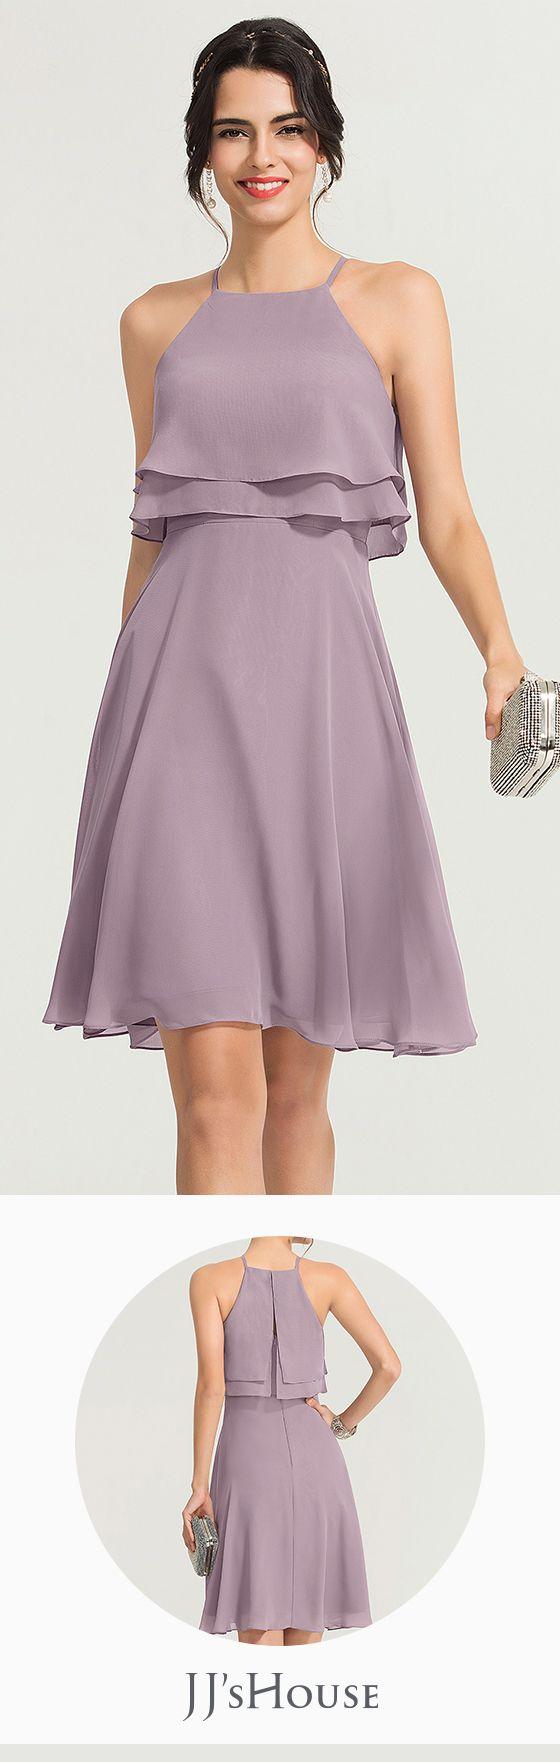 45+ Knee length chiffon dress ideas in 2021